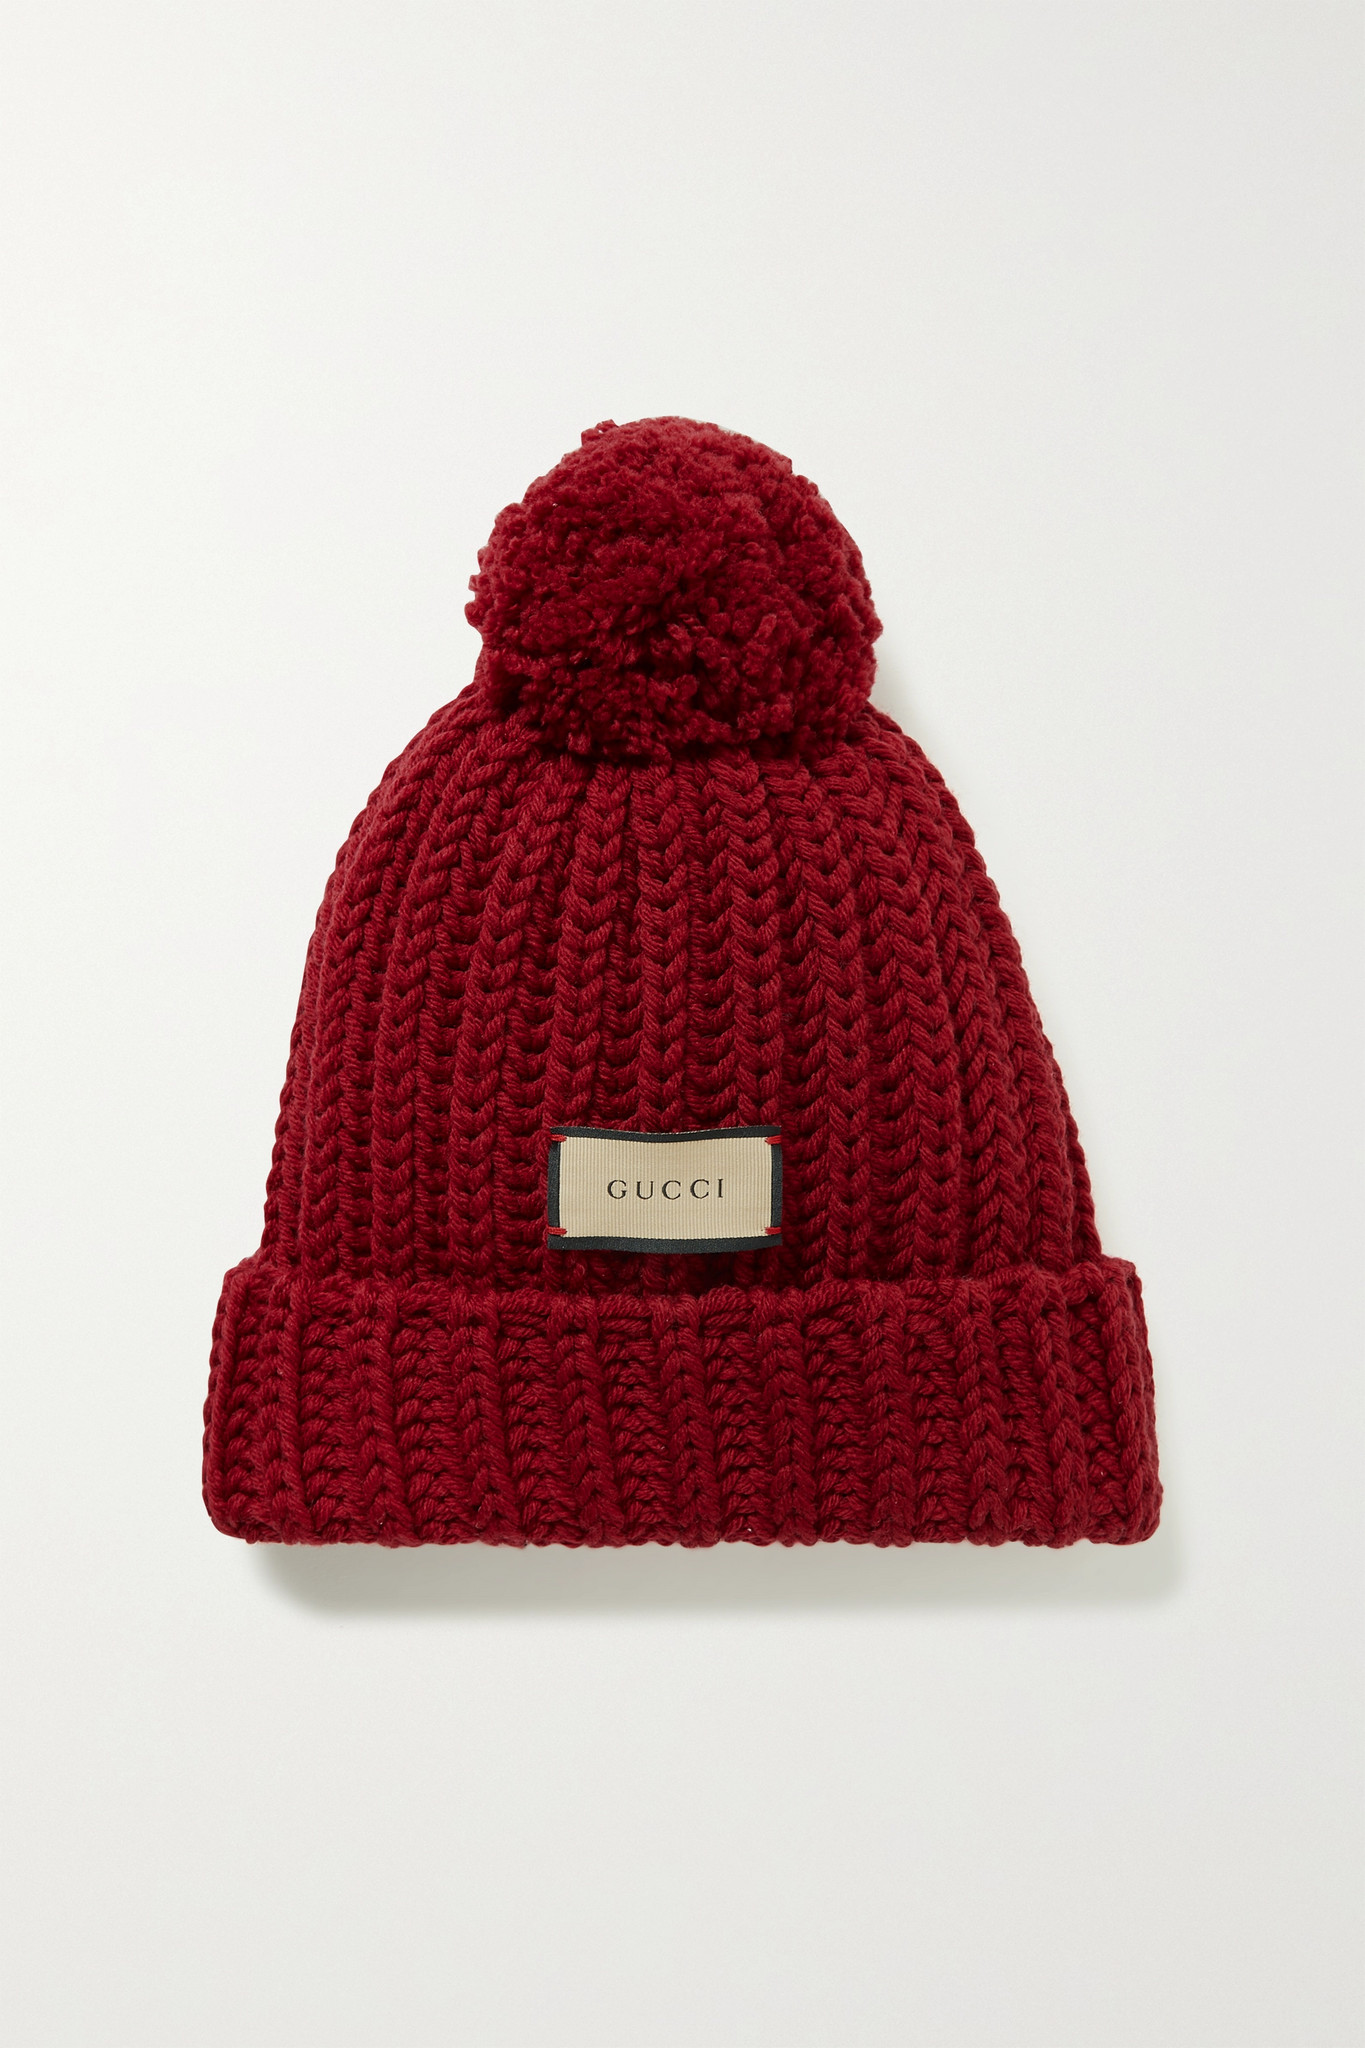 GUCCI - Pompom-embellished Ribbed Wool Beanie - Burgundy - S